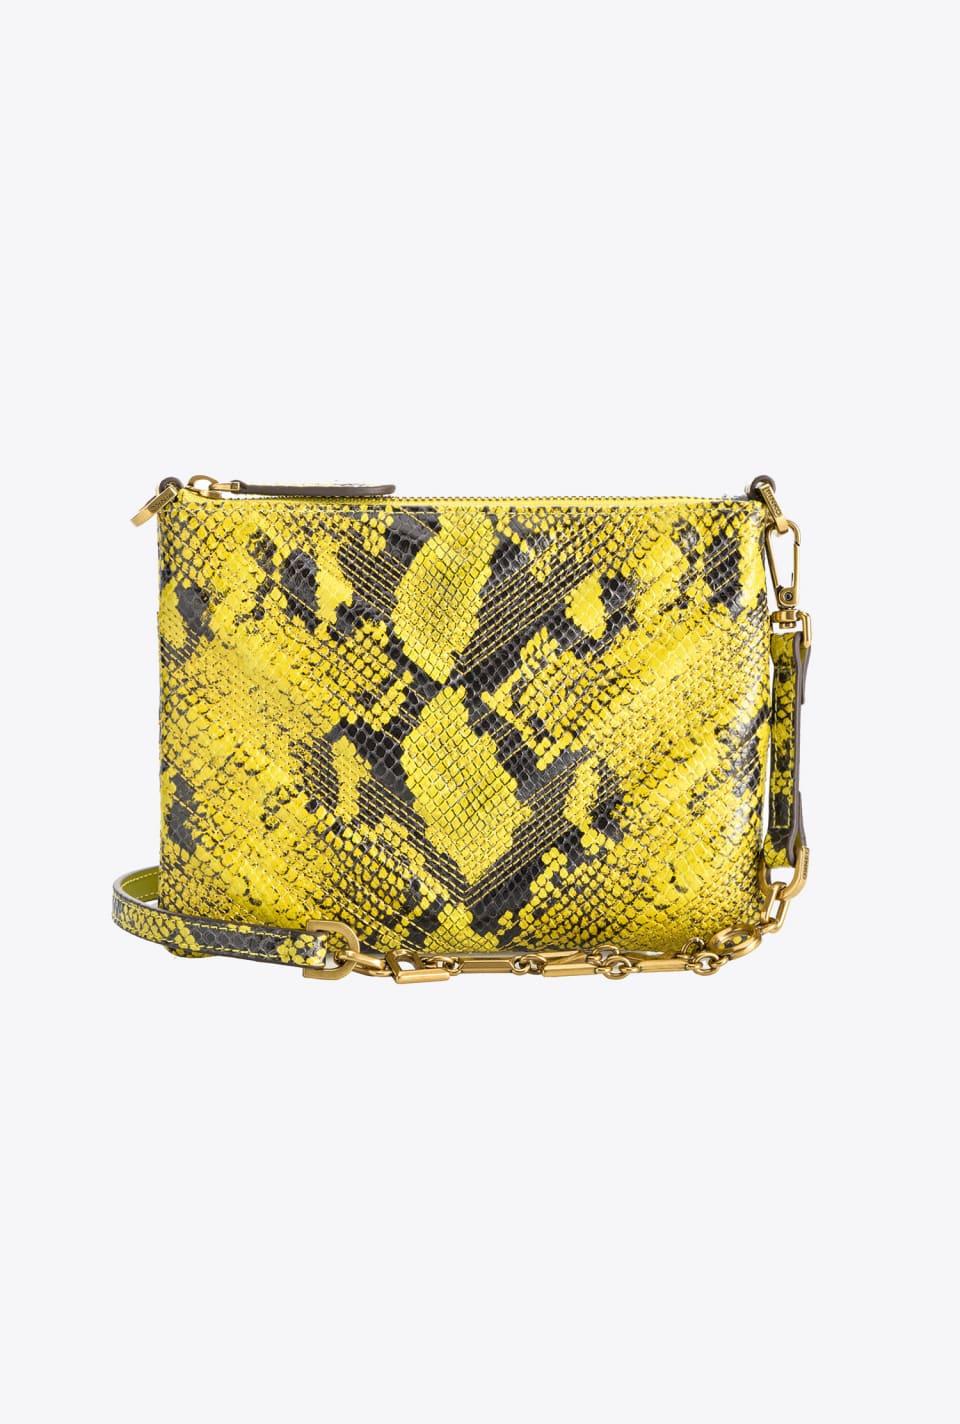 Exotics Flat手袋 - Pinko